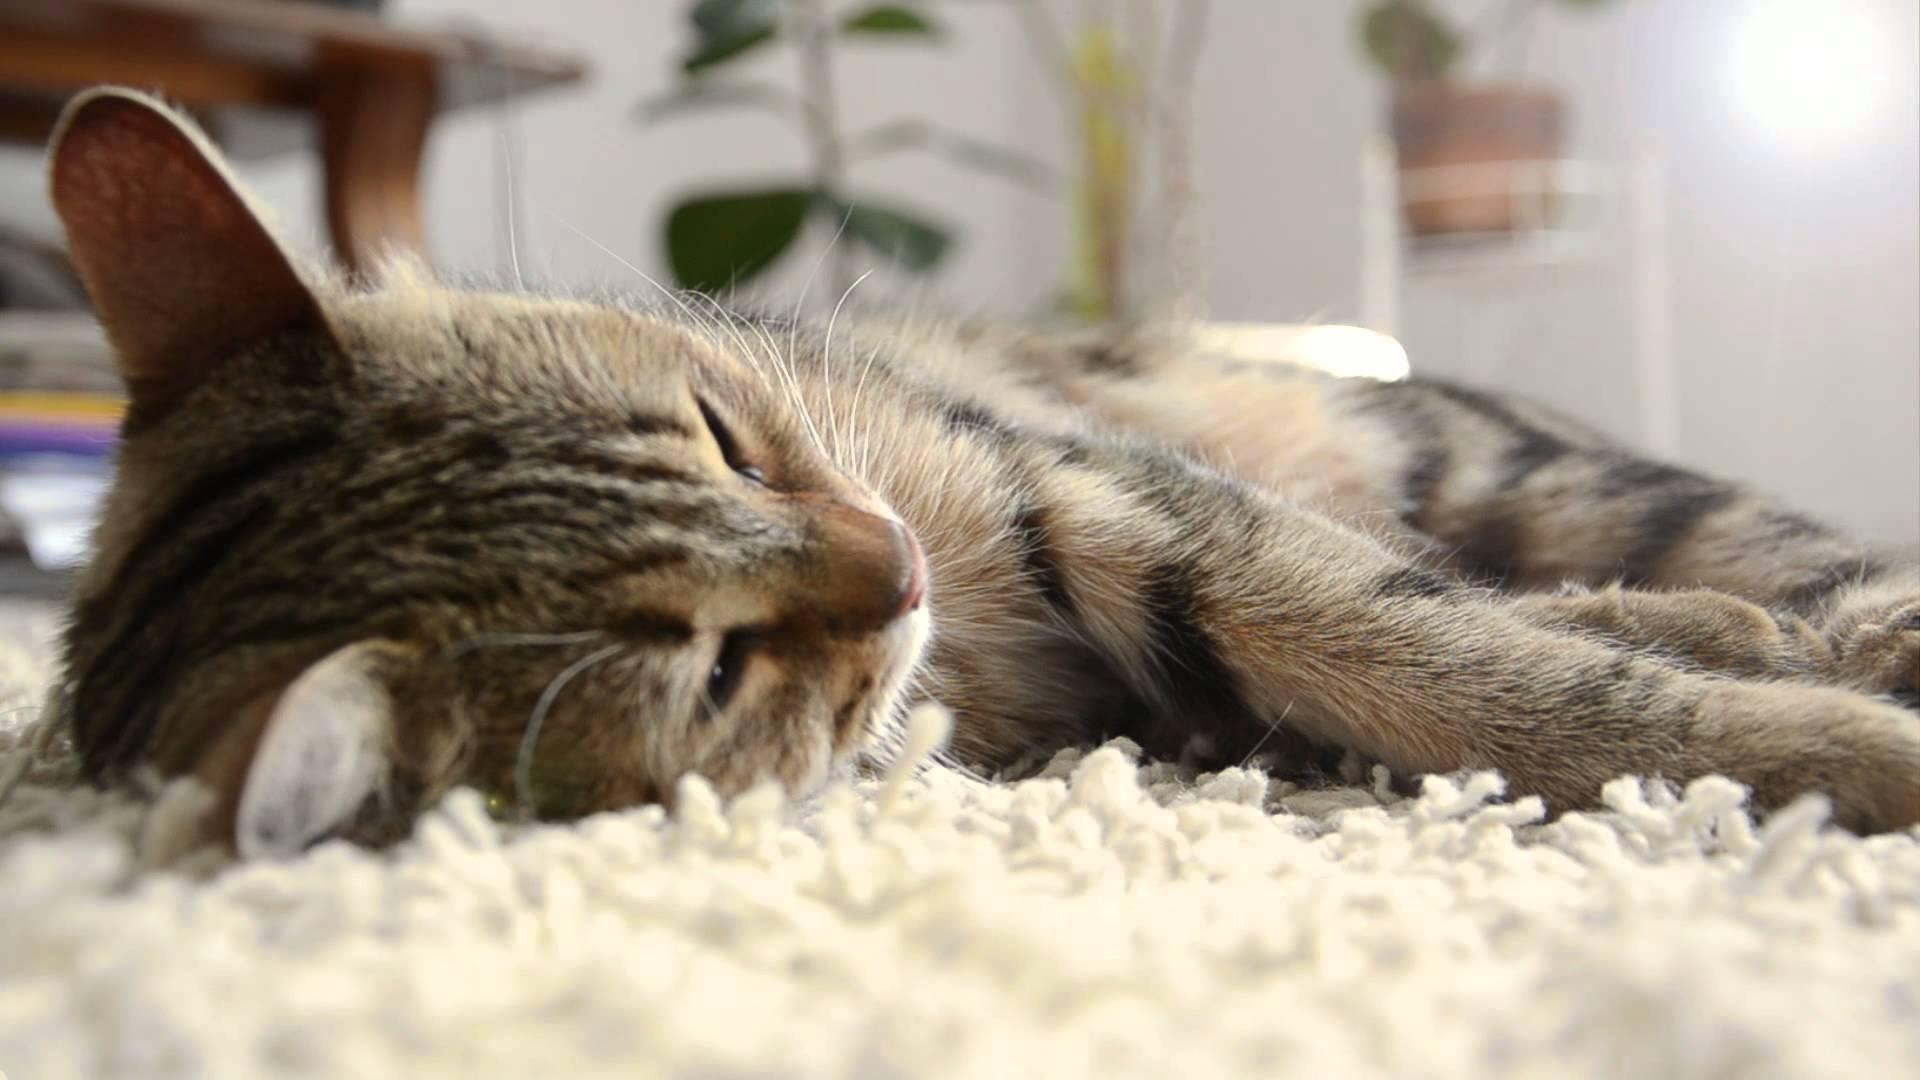 Cute Sleeping Cat Purring [HD] - YouTube